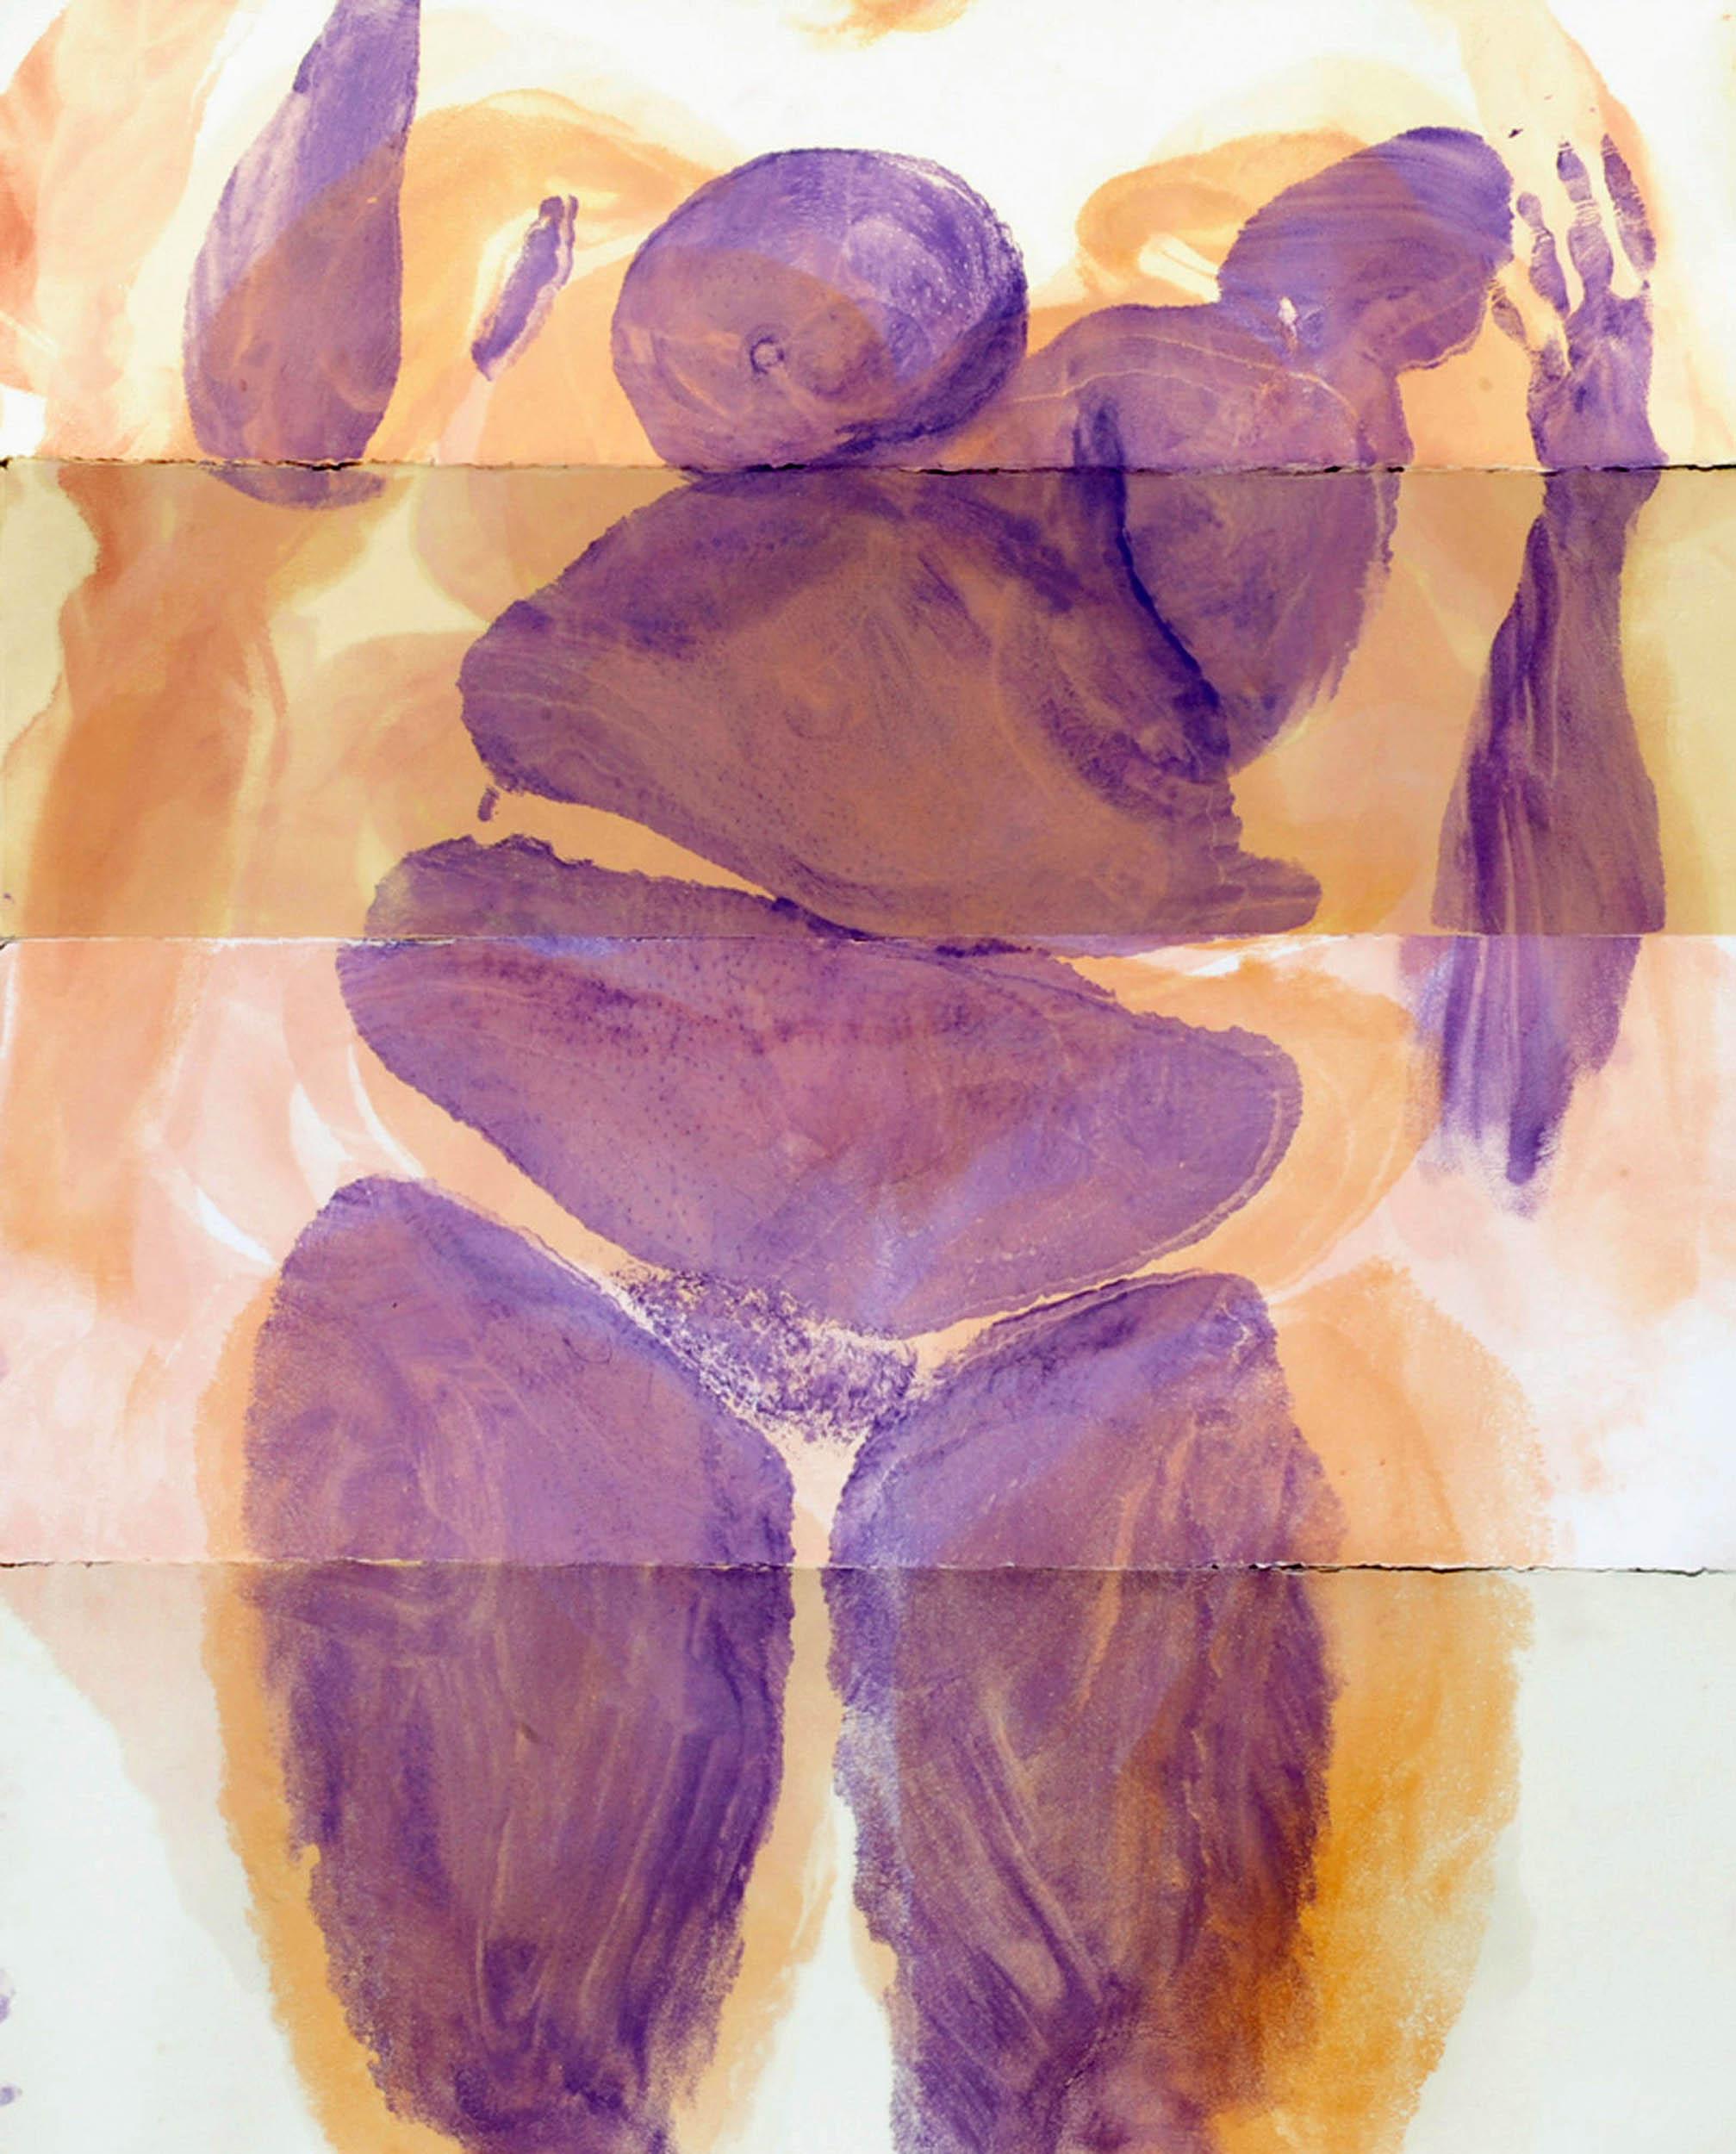 Body Prints Elisabeth Walden